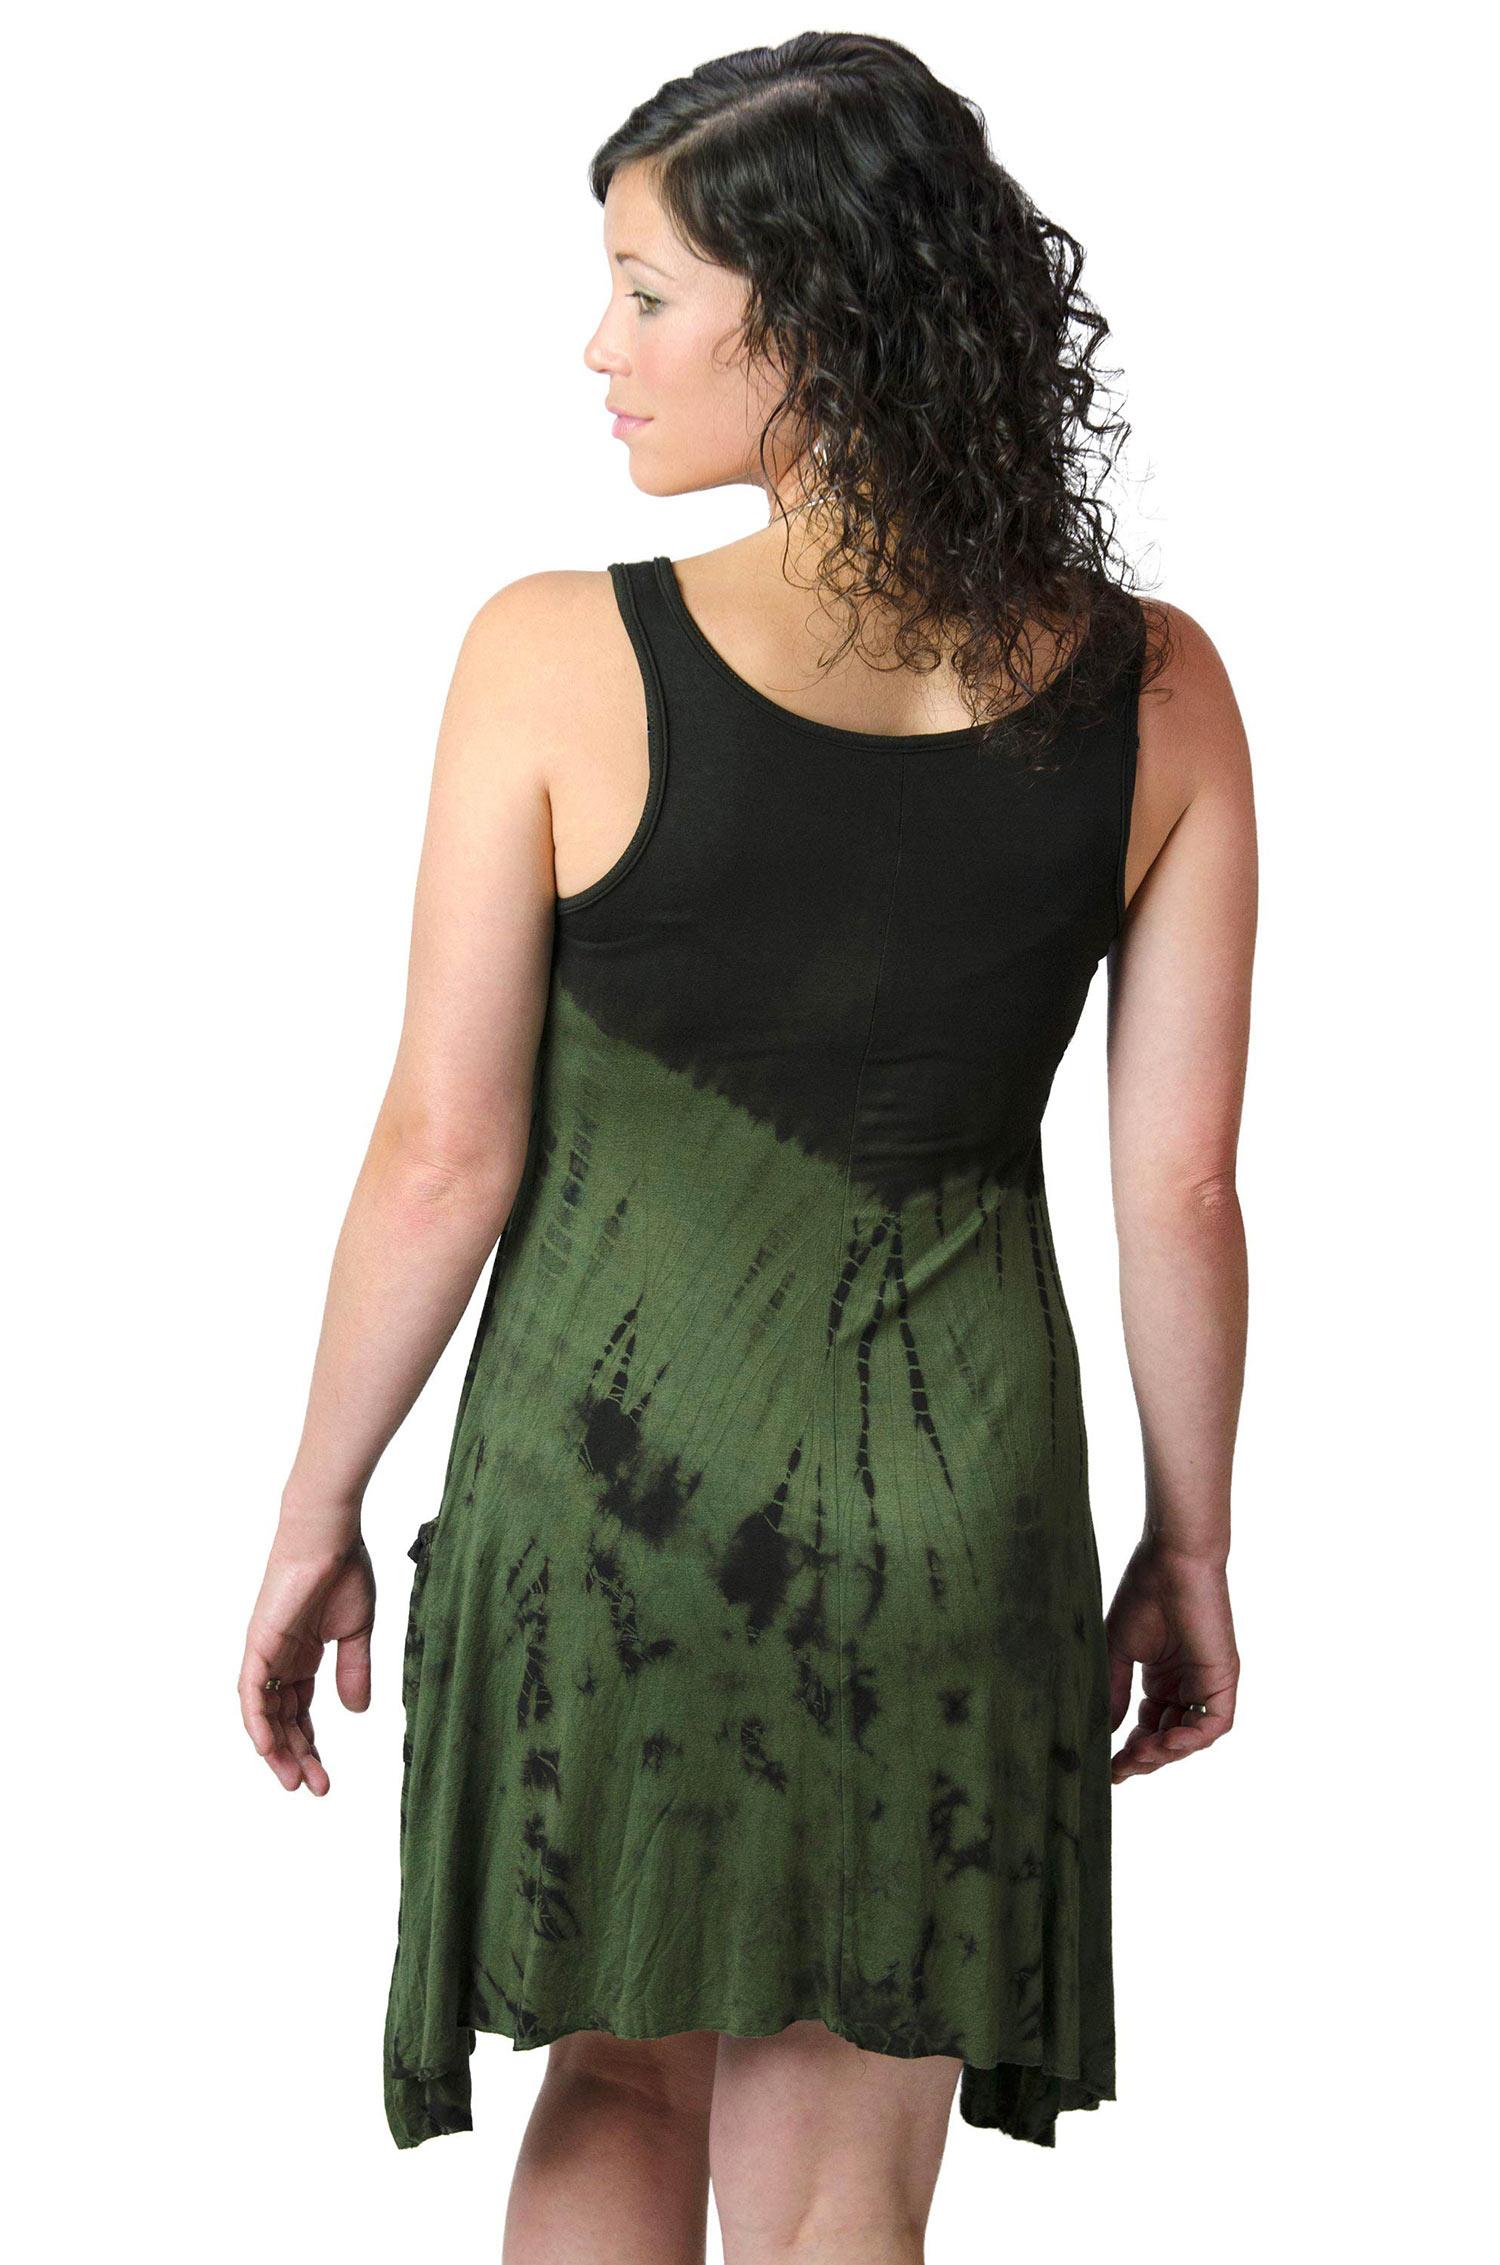 Pocket Sundress, Hand Painted Tie Dye, Black Olive Multi